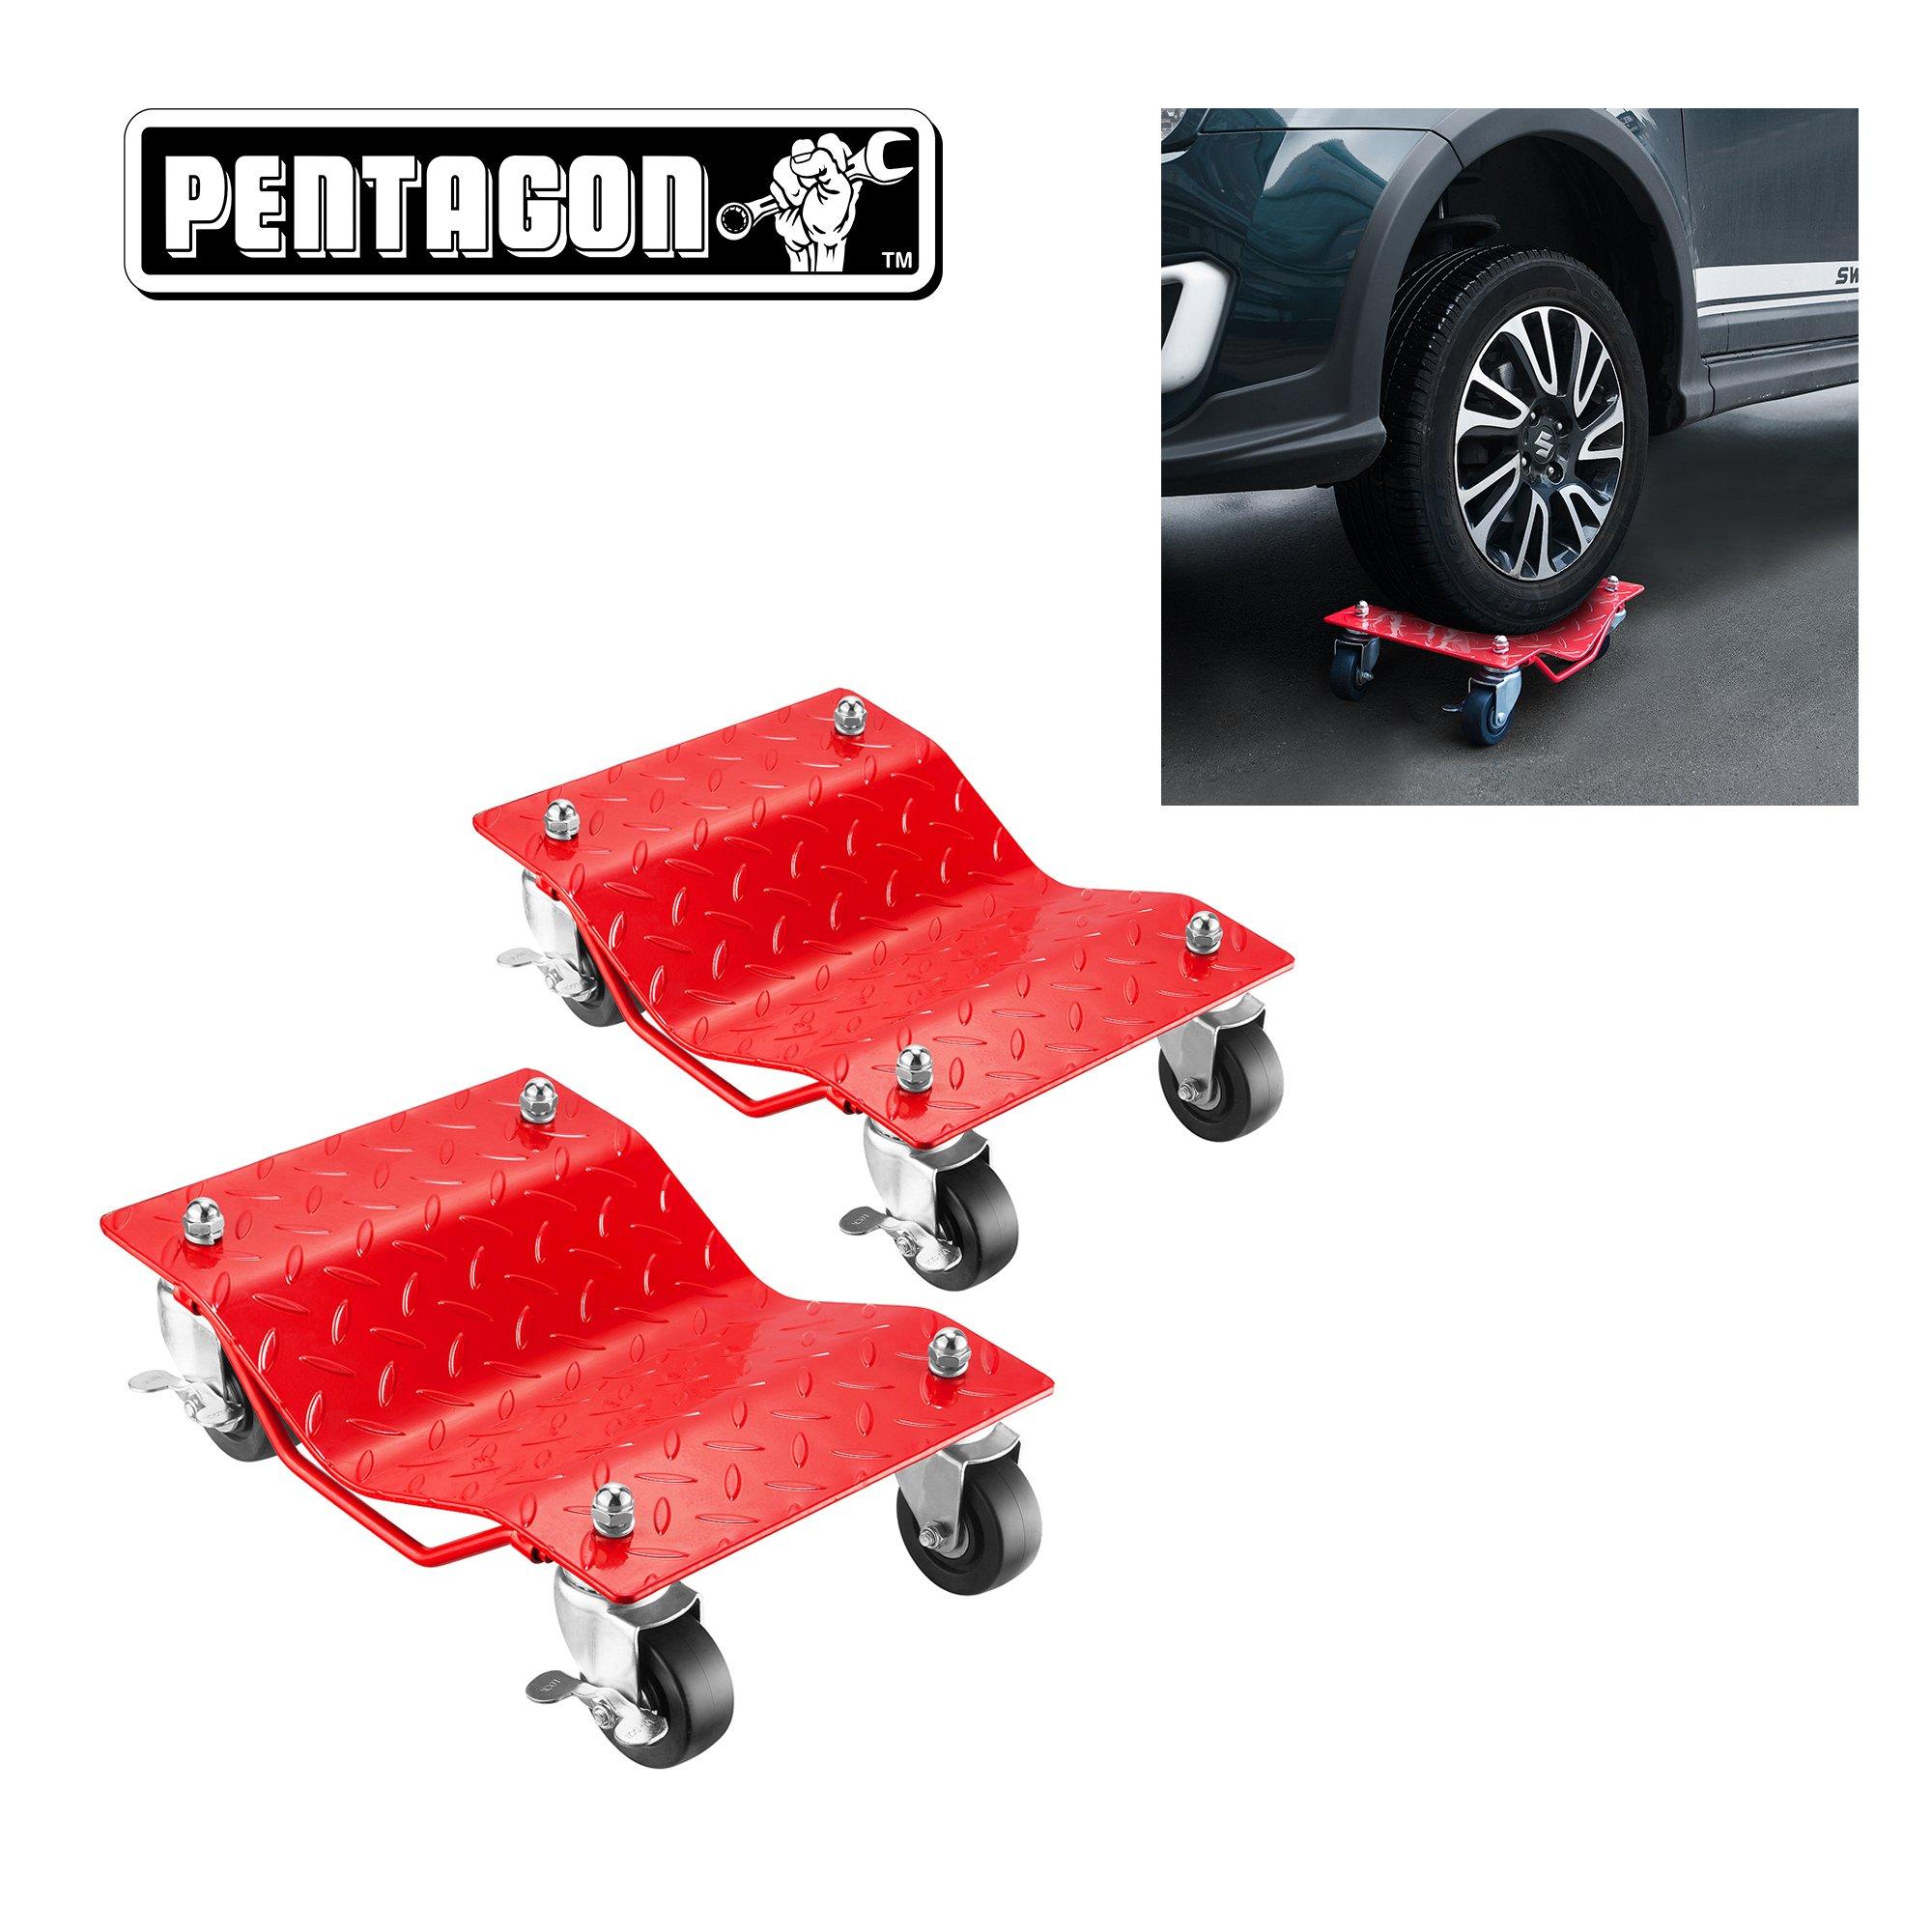 Pentagon 83-DT5500 5050 Tool | Premium 2-Pack | Car Dolly-Tire Skates Red